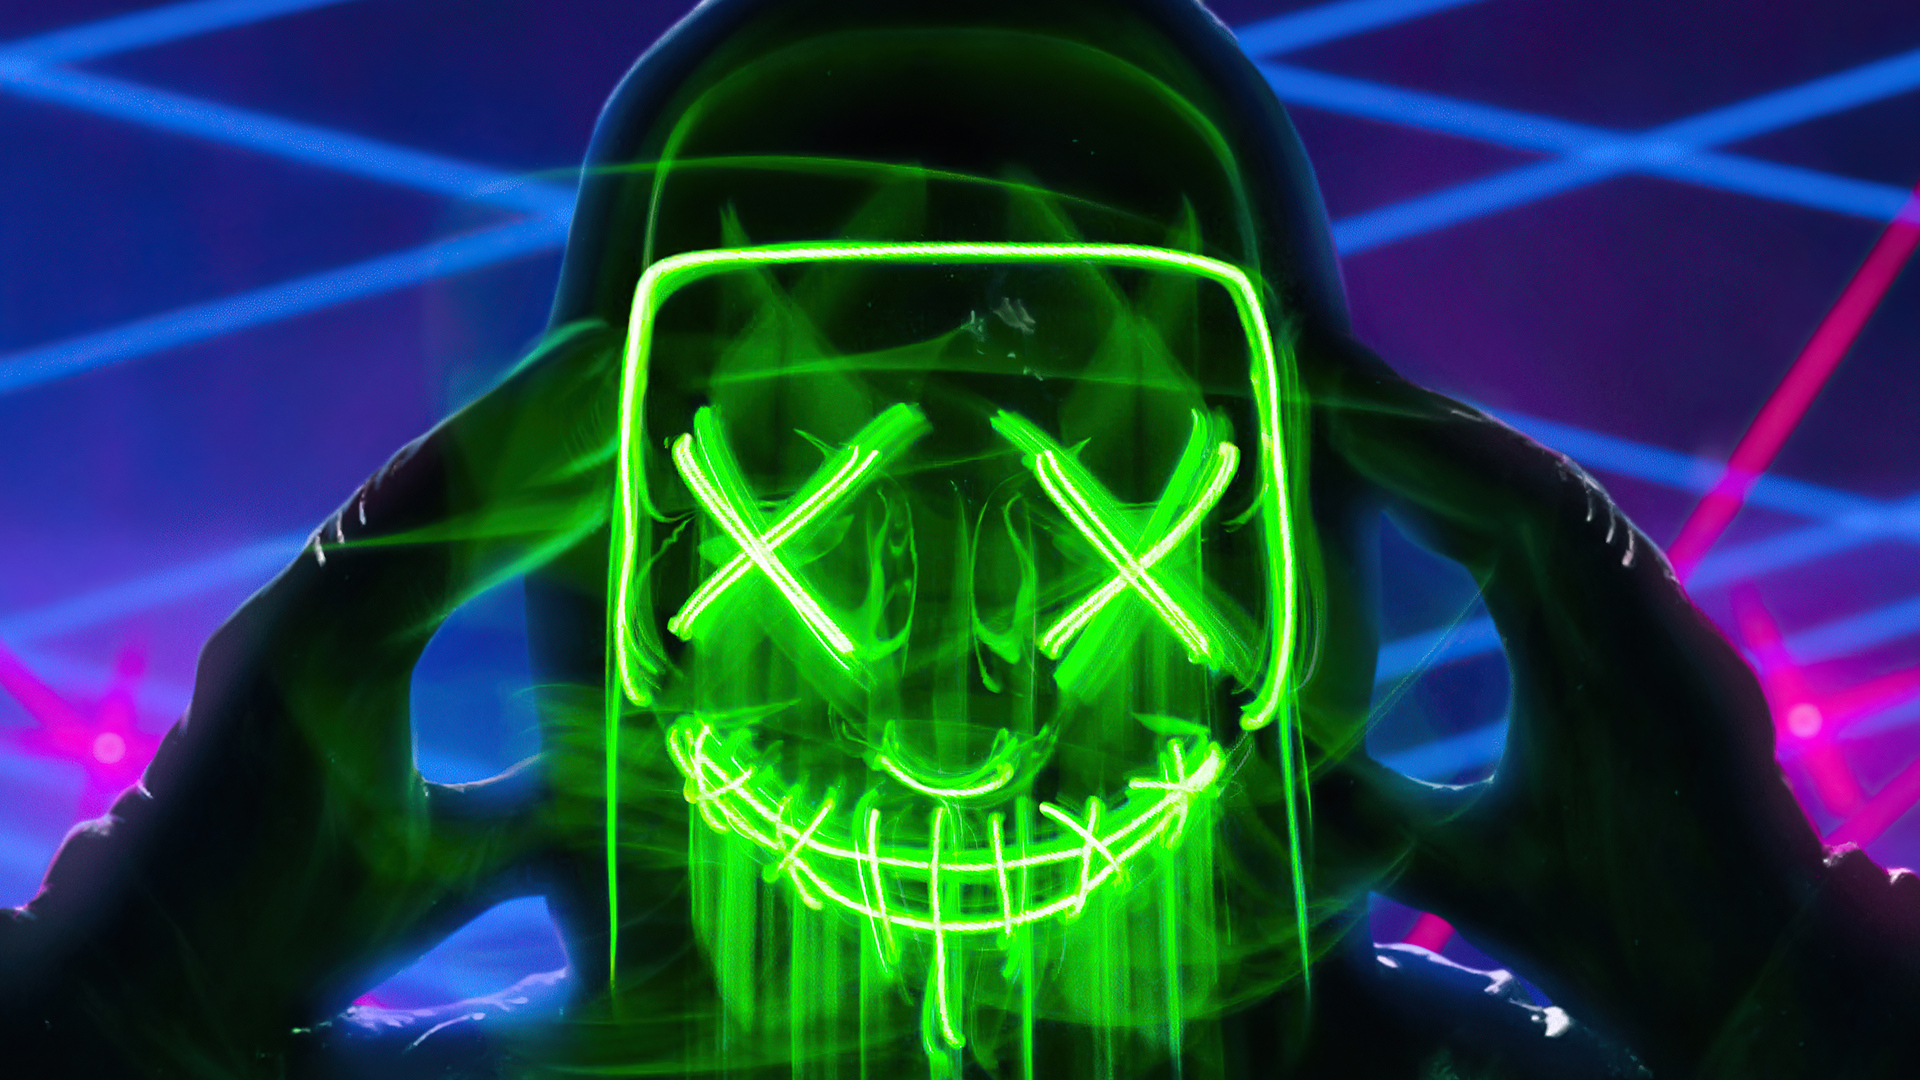 1920x1080 Neon Green Mask Triangle Guy 4k Laptop Full HD ...